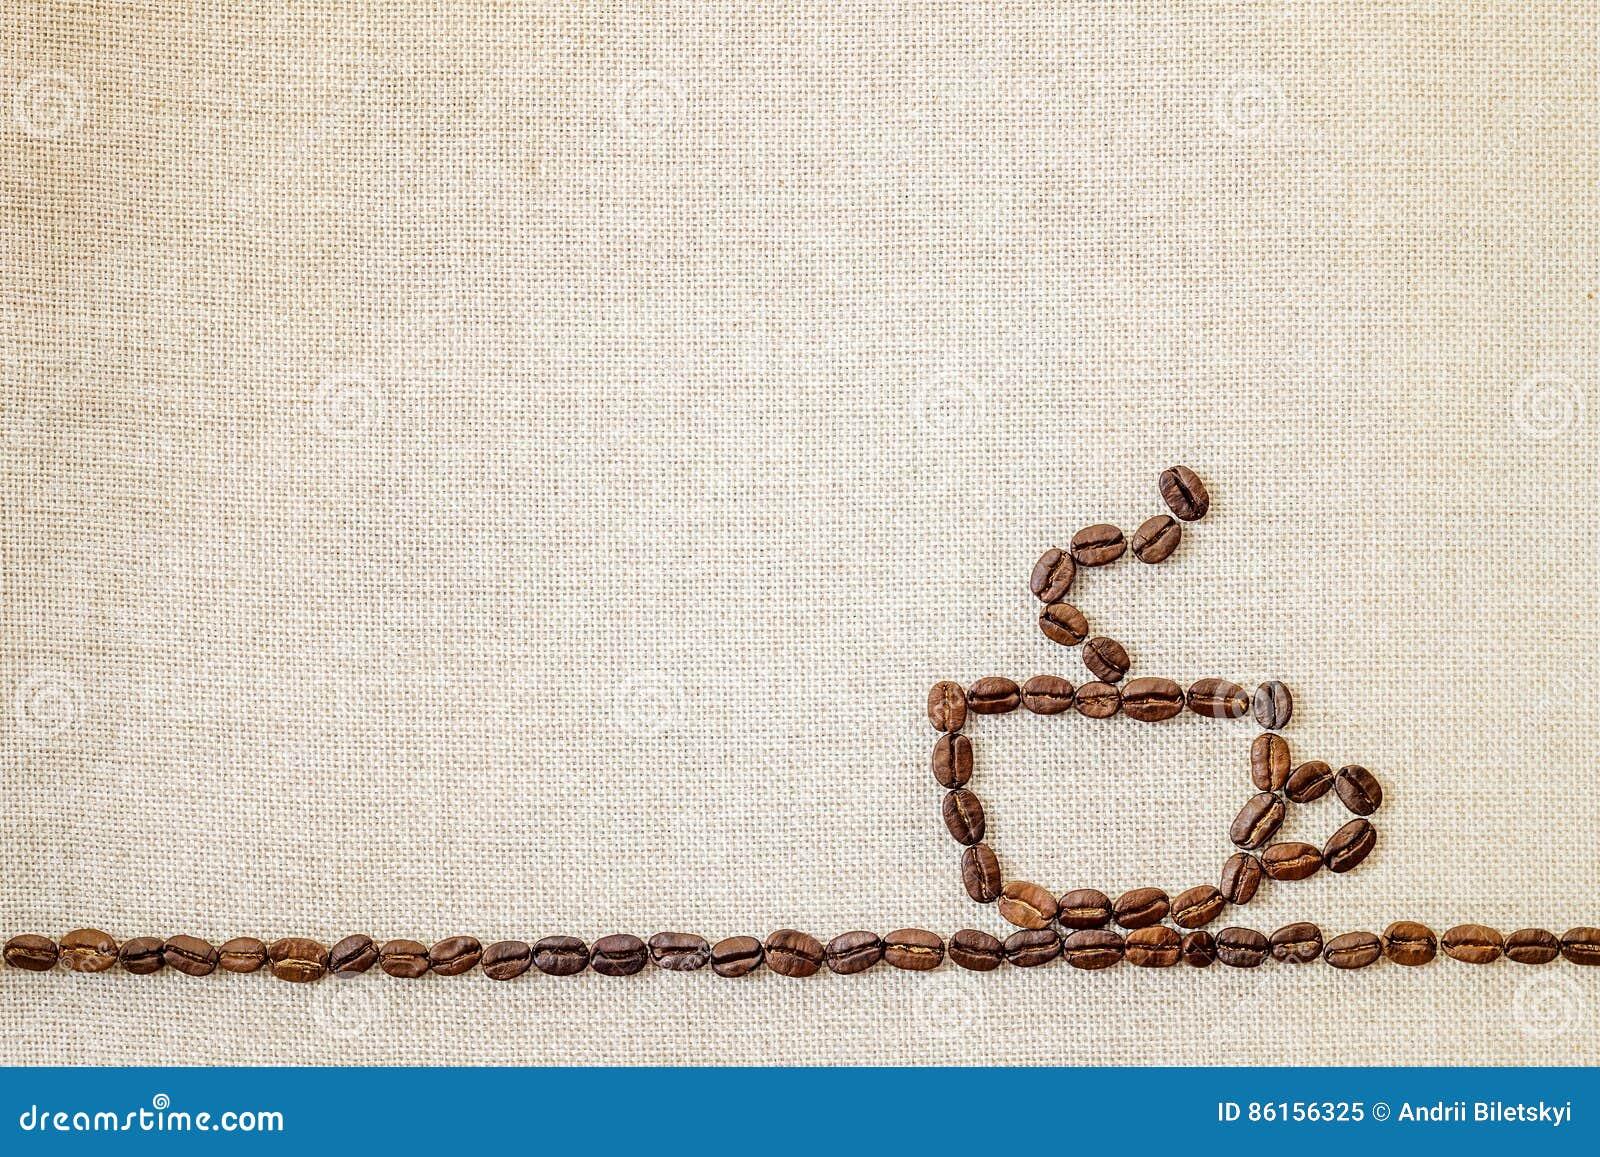 Burlap Sackcloth καμβάς και υπόβαθρο φωτογραφιών φασολιών καφέ αντίγραφο